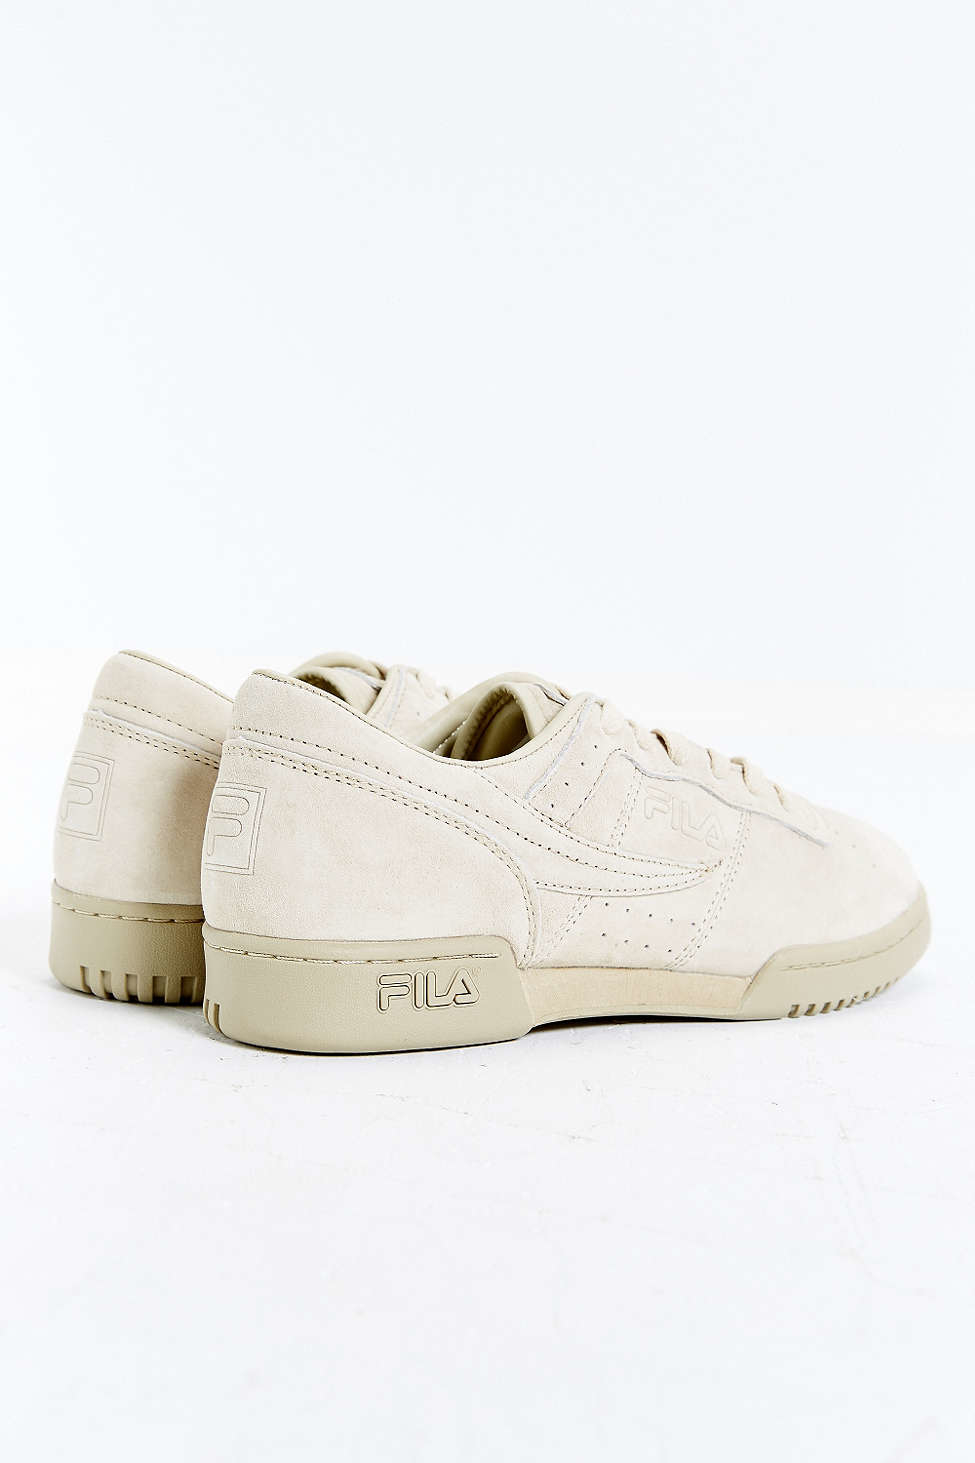 4616beccc3b9 Lyst - Fila Original Fitness Suede Sneaker in Brown for Men